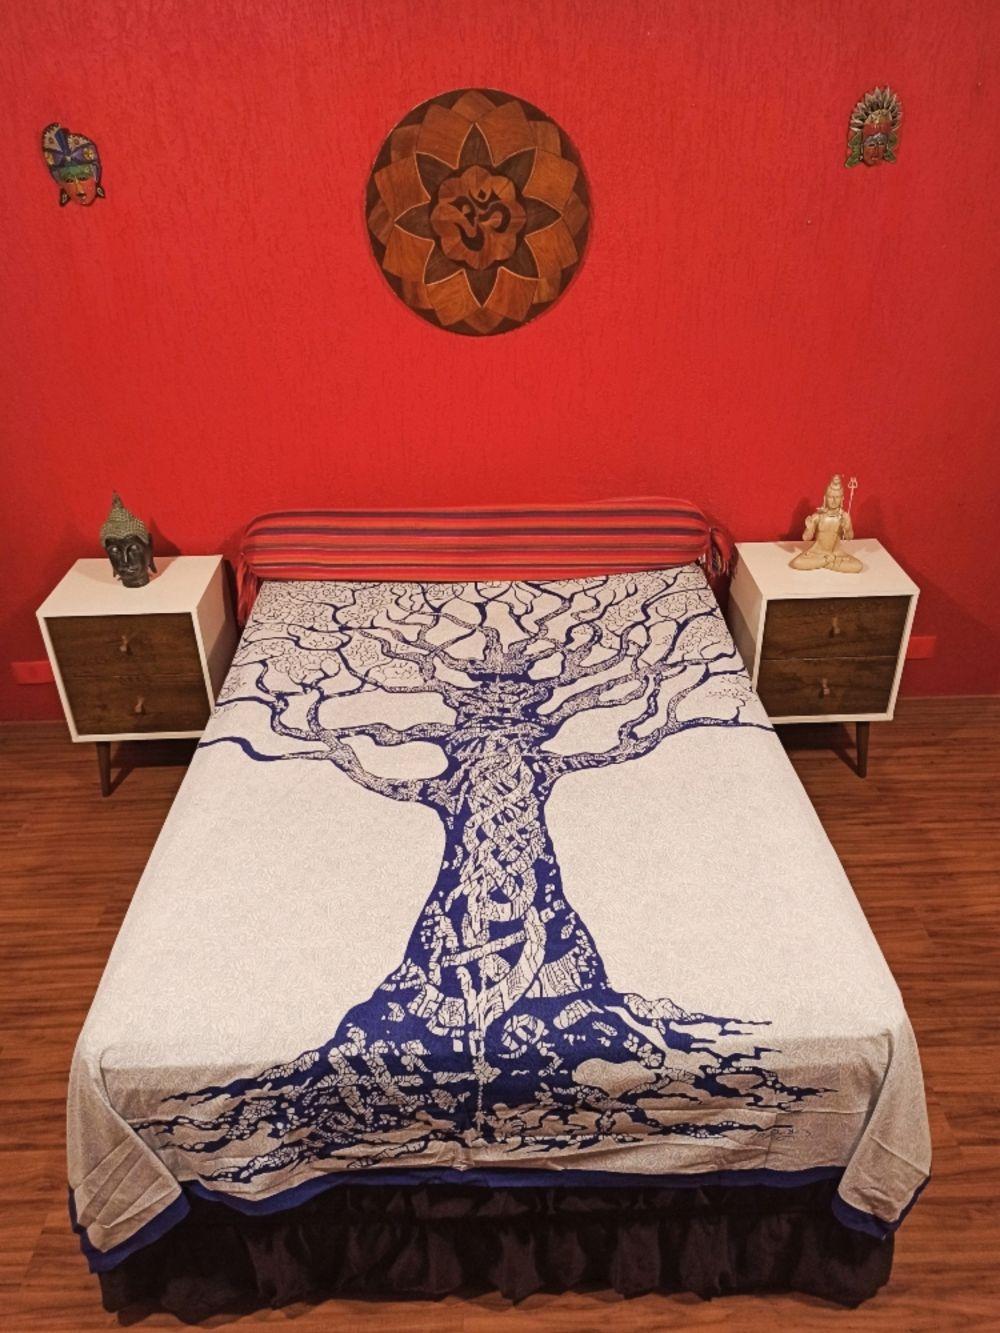 Colcha Indiana Casal Arvore Da Vida Azul / Laranja Cobre Leito Painelvvv